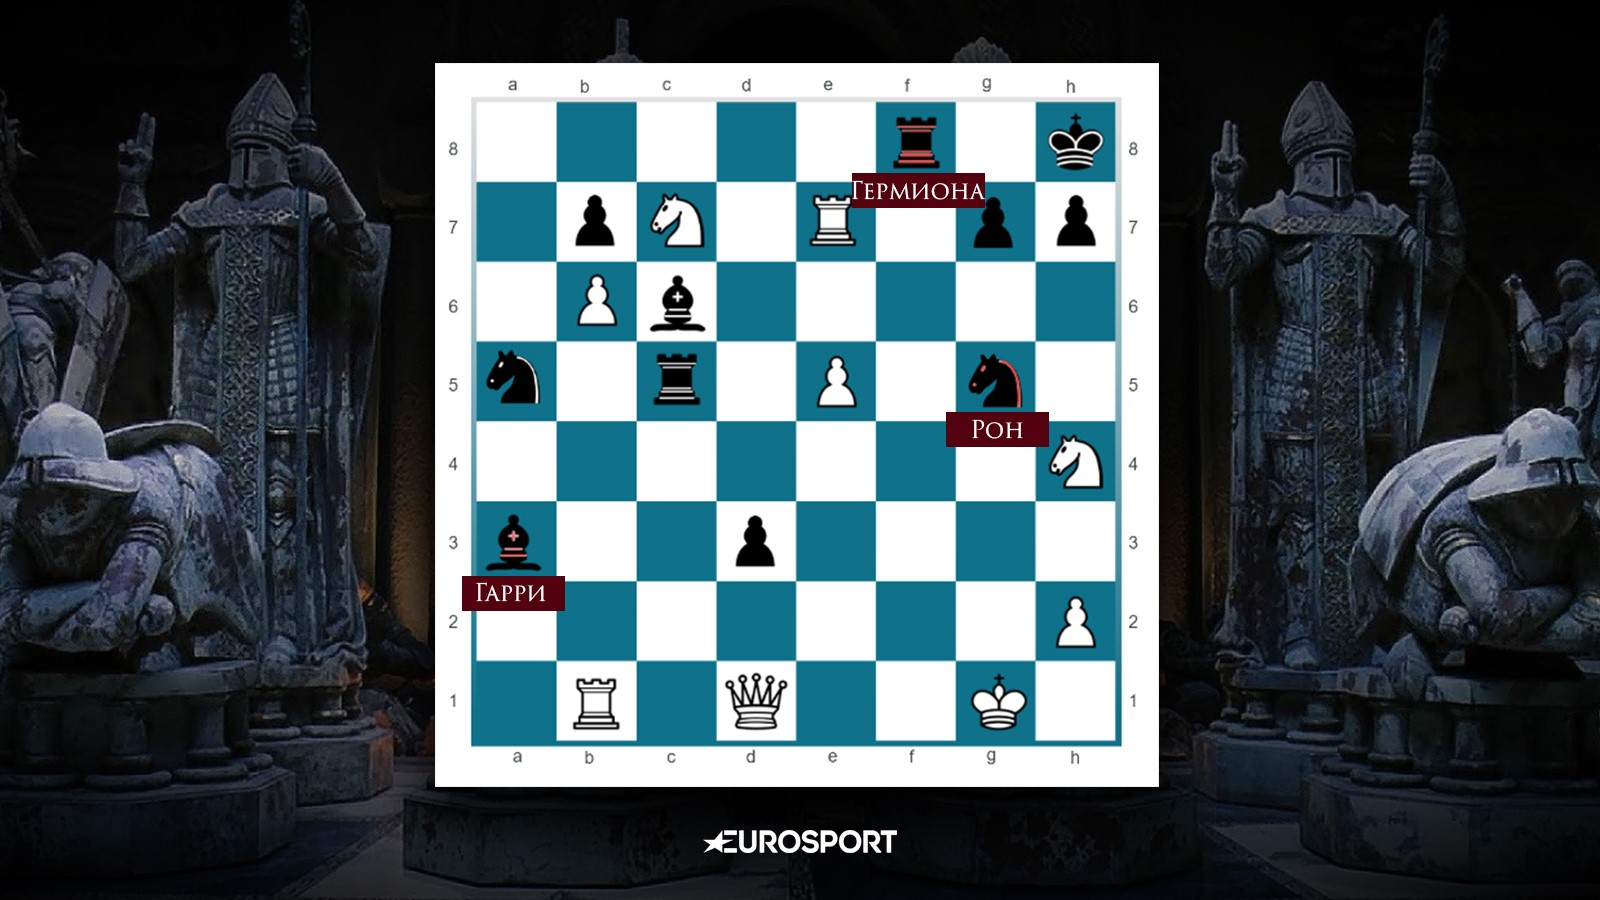 https://i.eurosport.com/2021/01/08/2967121.jpg